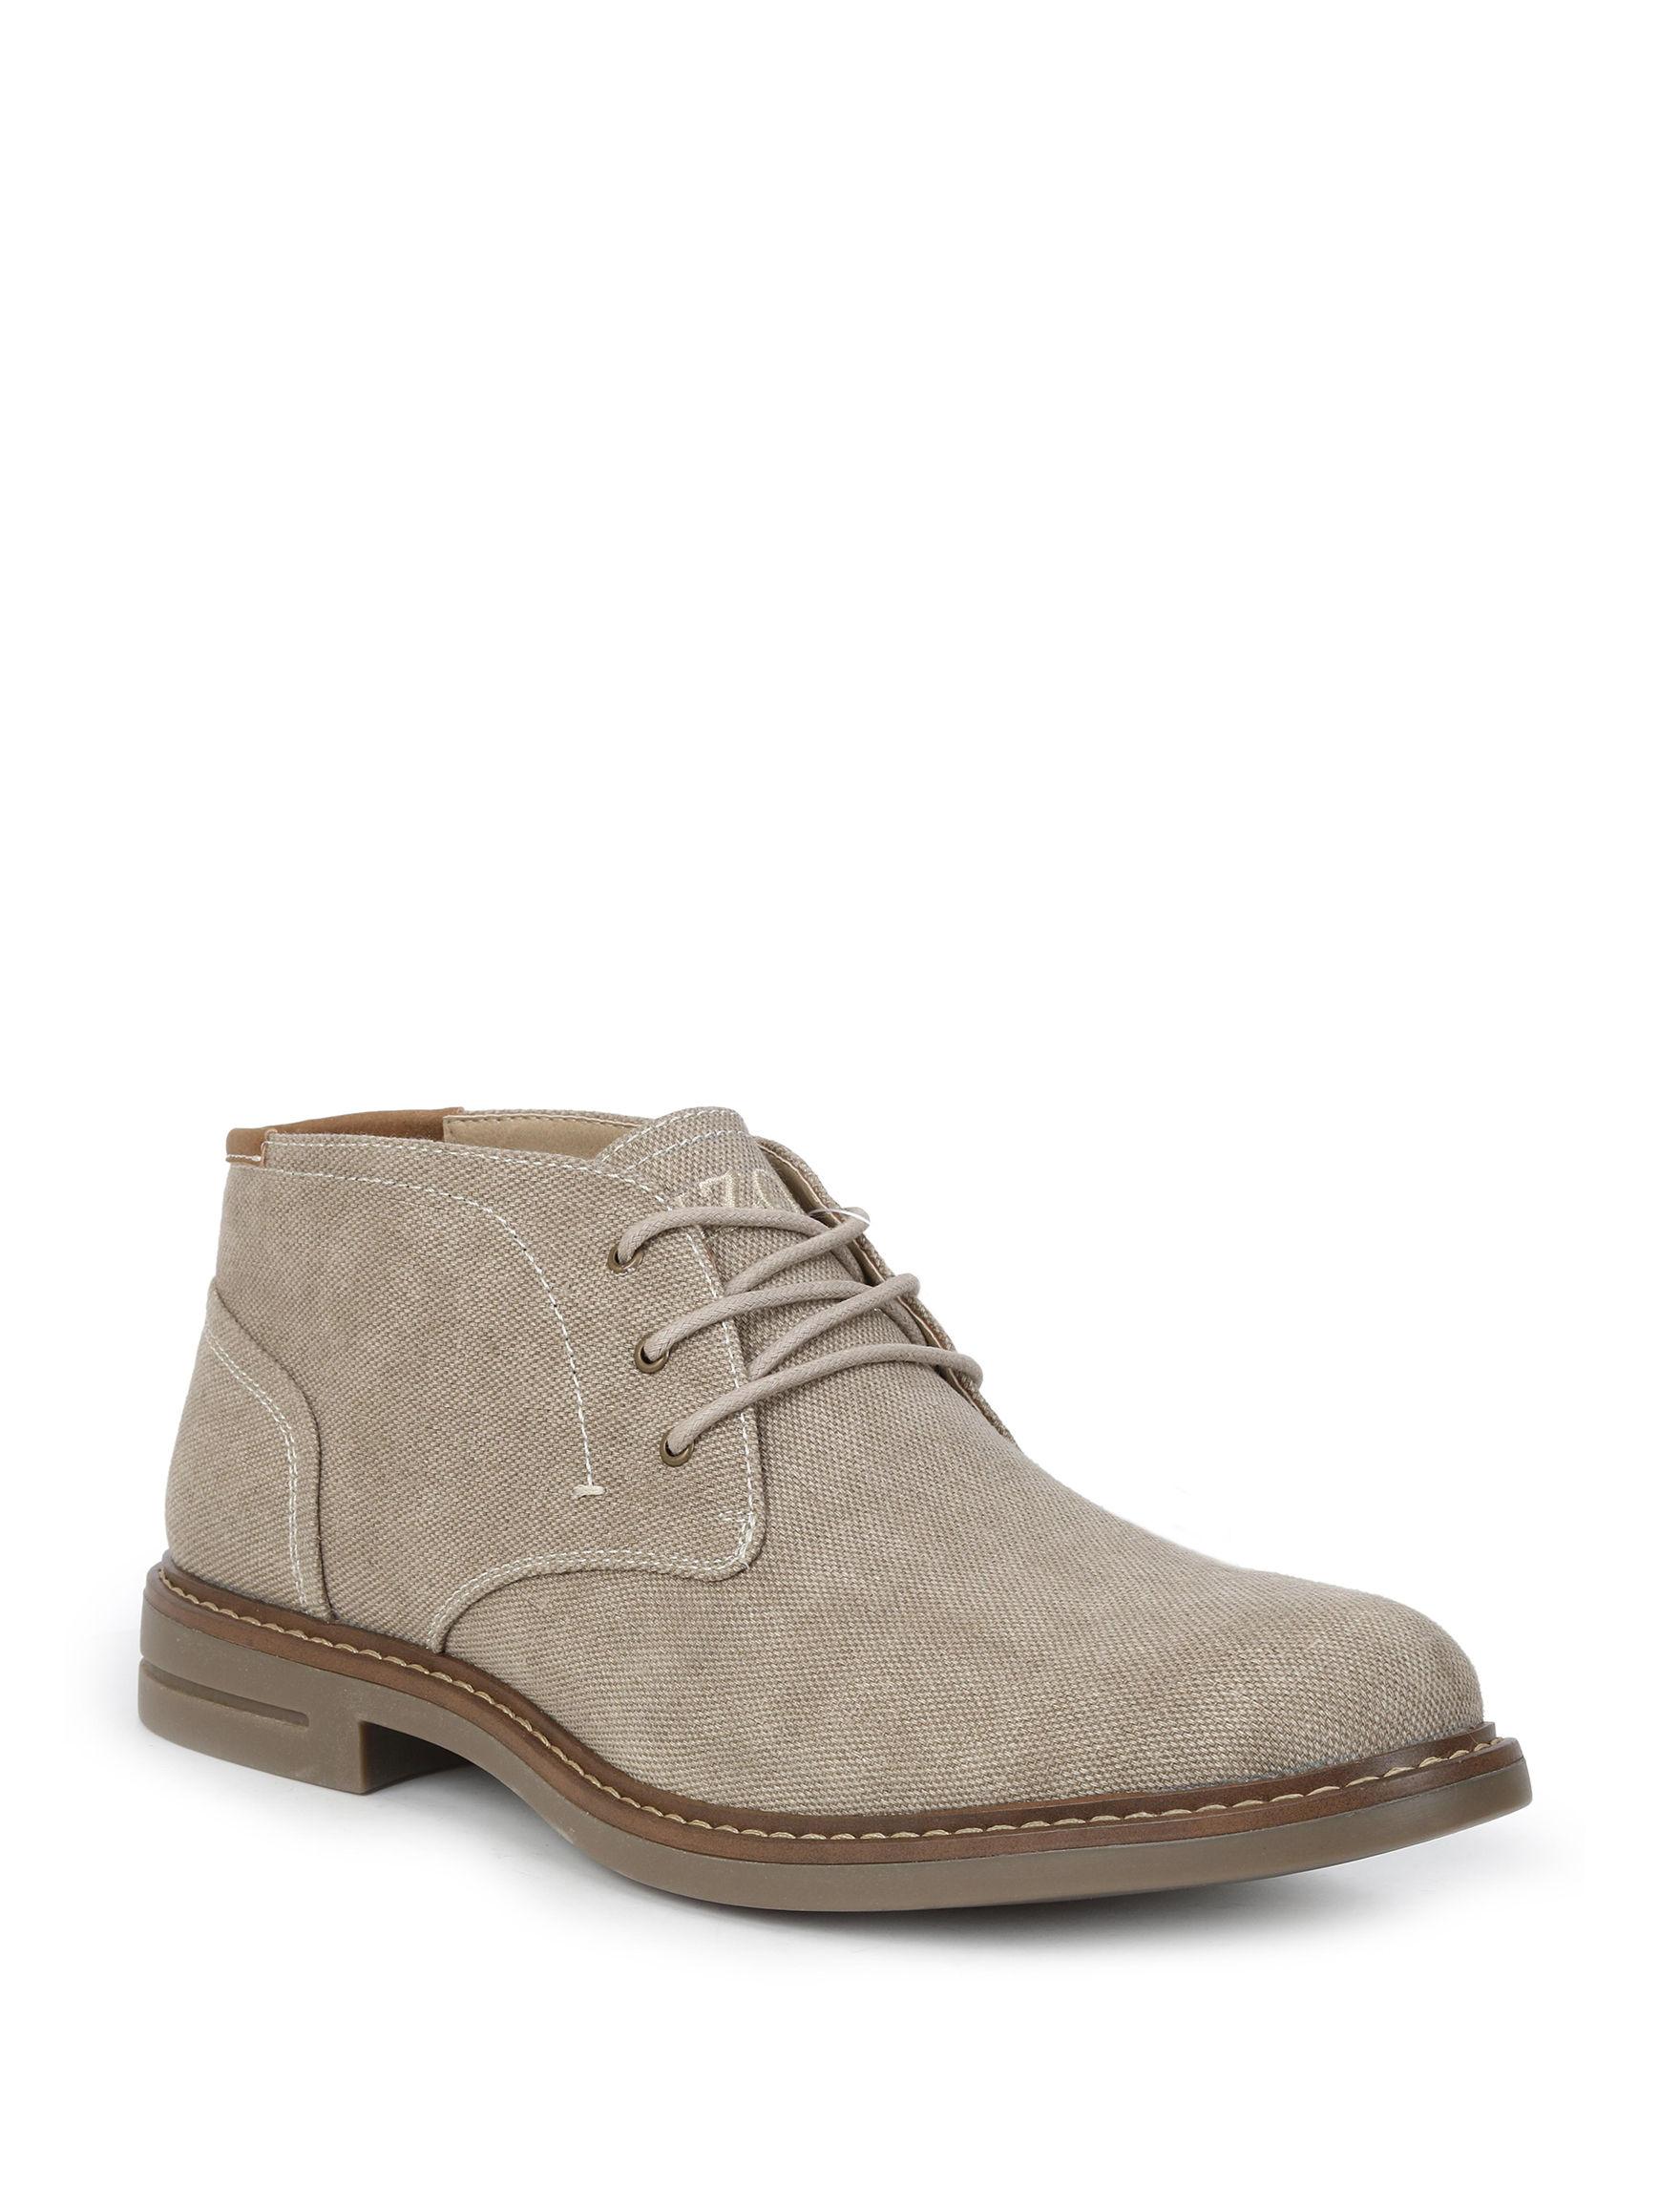 Izod Brown Chukka Boots